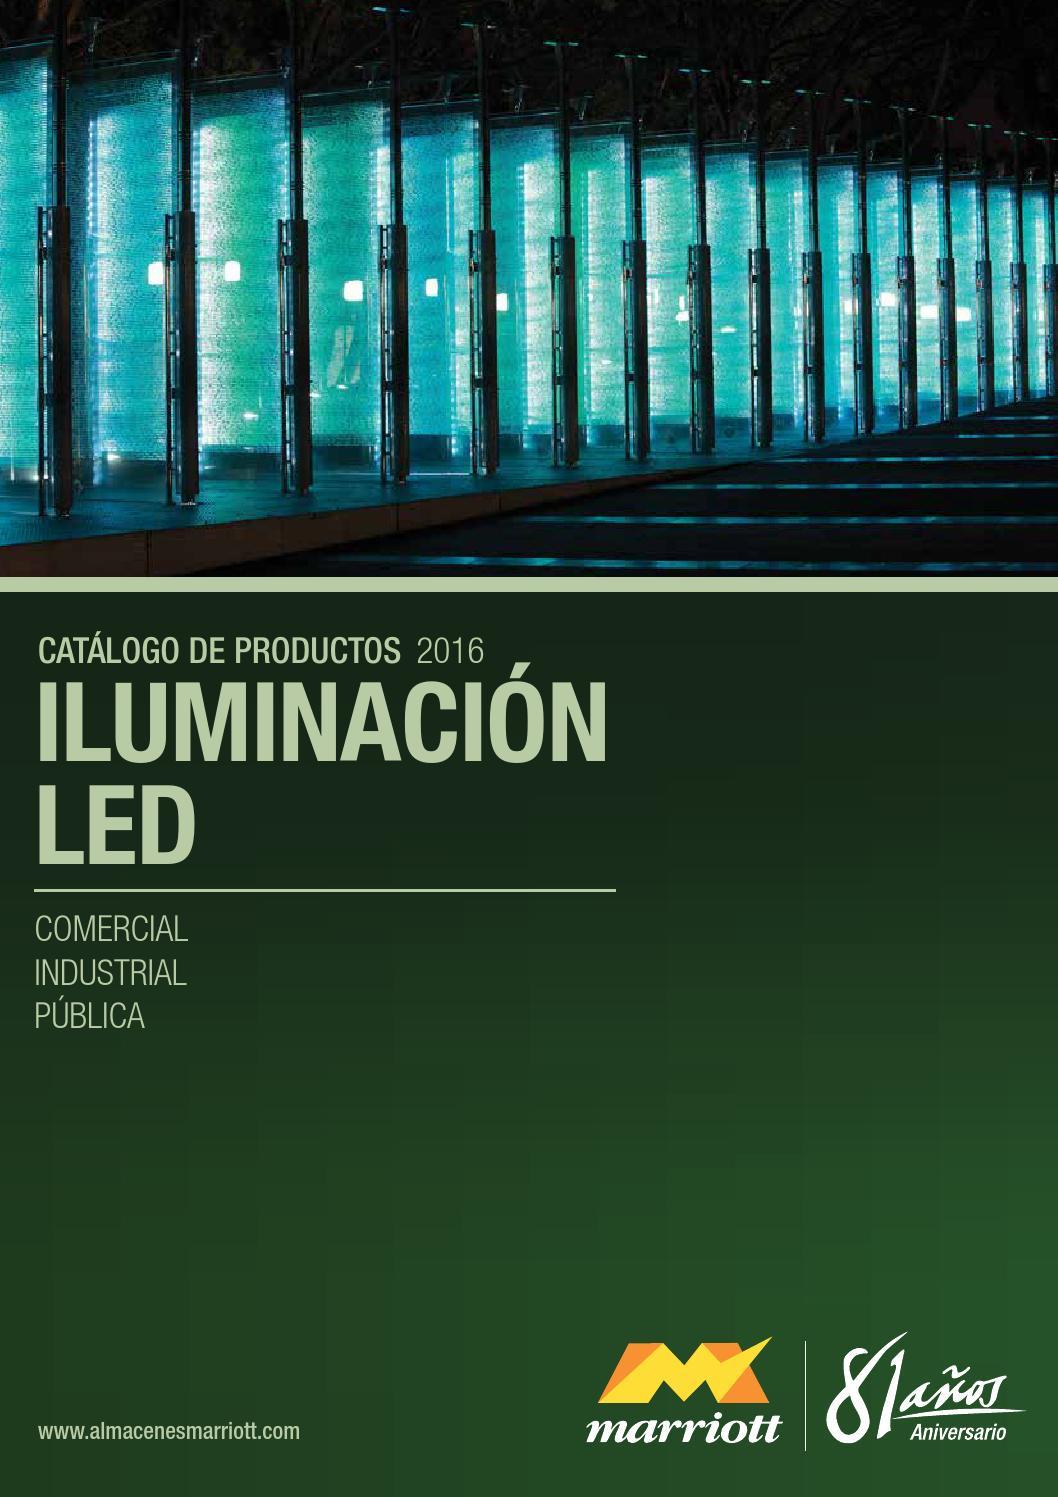 Iluminacin led catlogo 2016 by Almacenes Marriott  Issuu